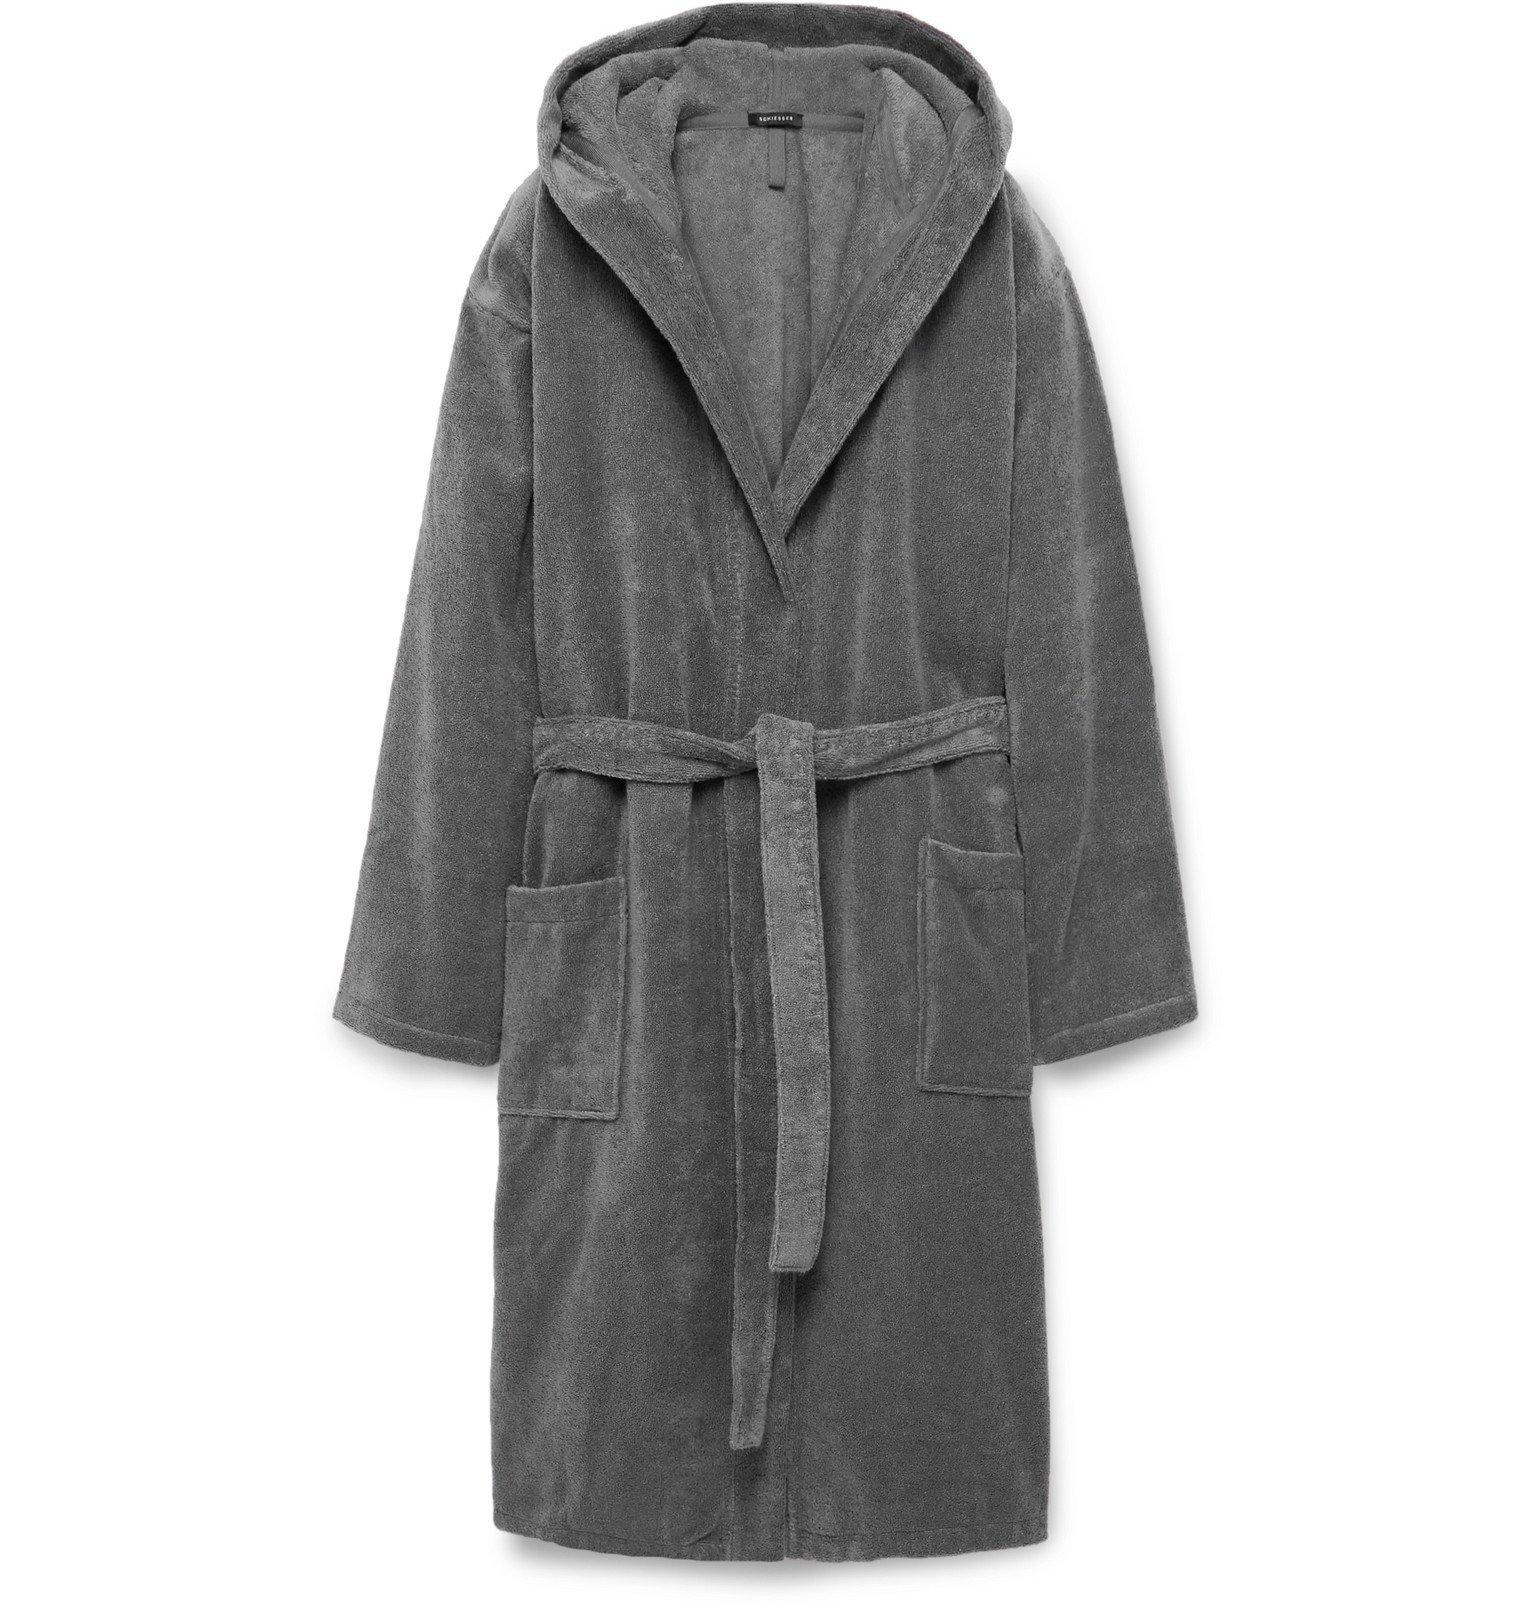 Schiesser - Cotton-Terry Hooded Robe - Gray